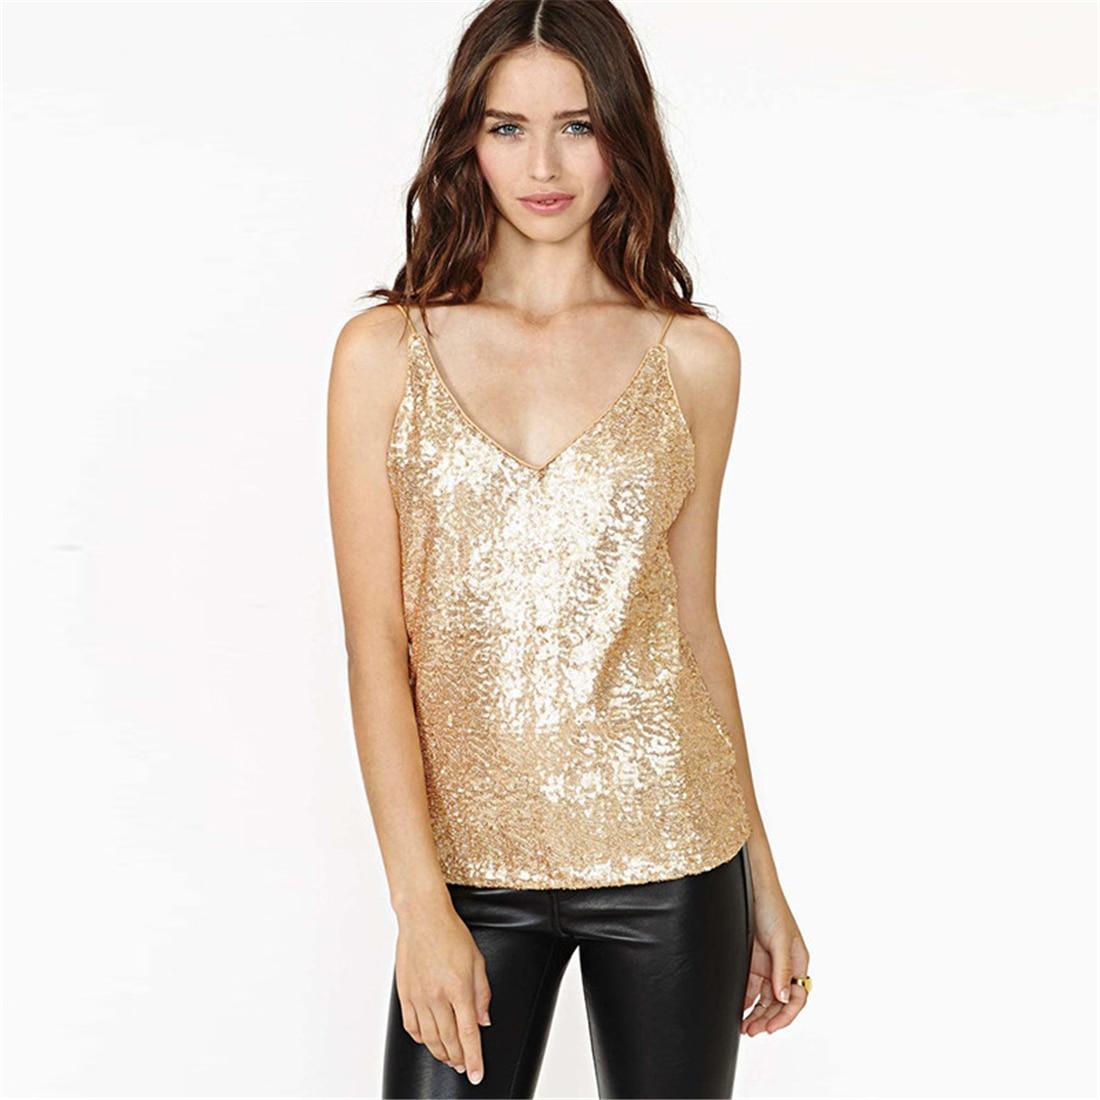 HTB1p0CiRVXXXXbuaXXXq6xXFXXXW - Tank Top Summer Sexy Sleeveless Shirts Gold JKP089